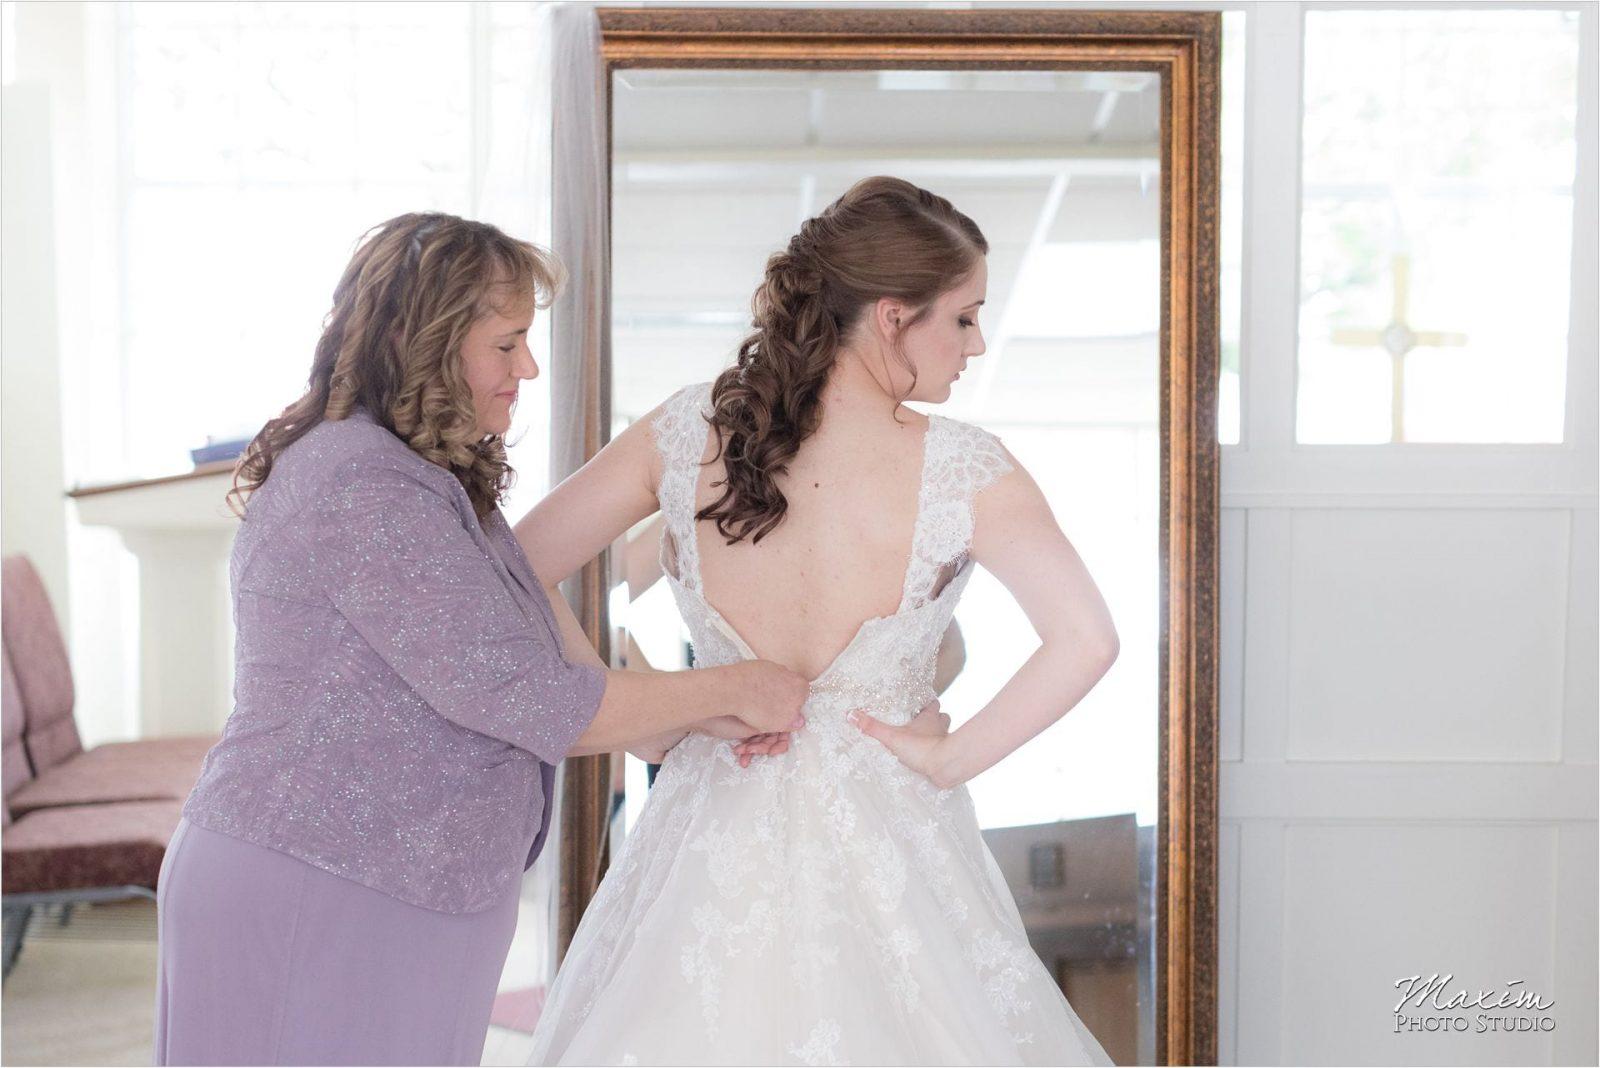 Norlyn Manor, Cincinnati Wedding Photography, Bride preparations, Fabulous Bridal Wedding Dress